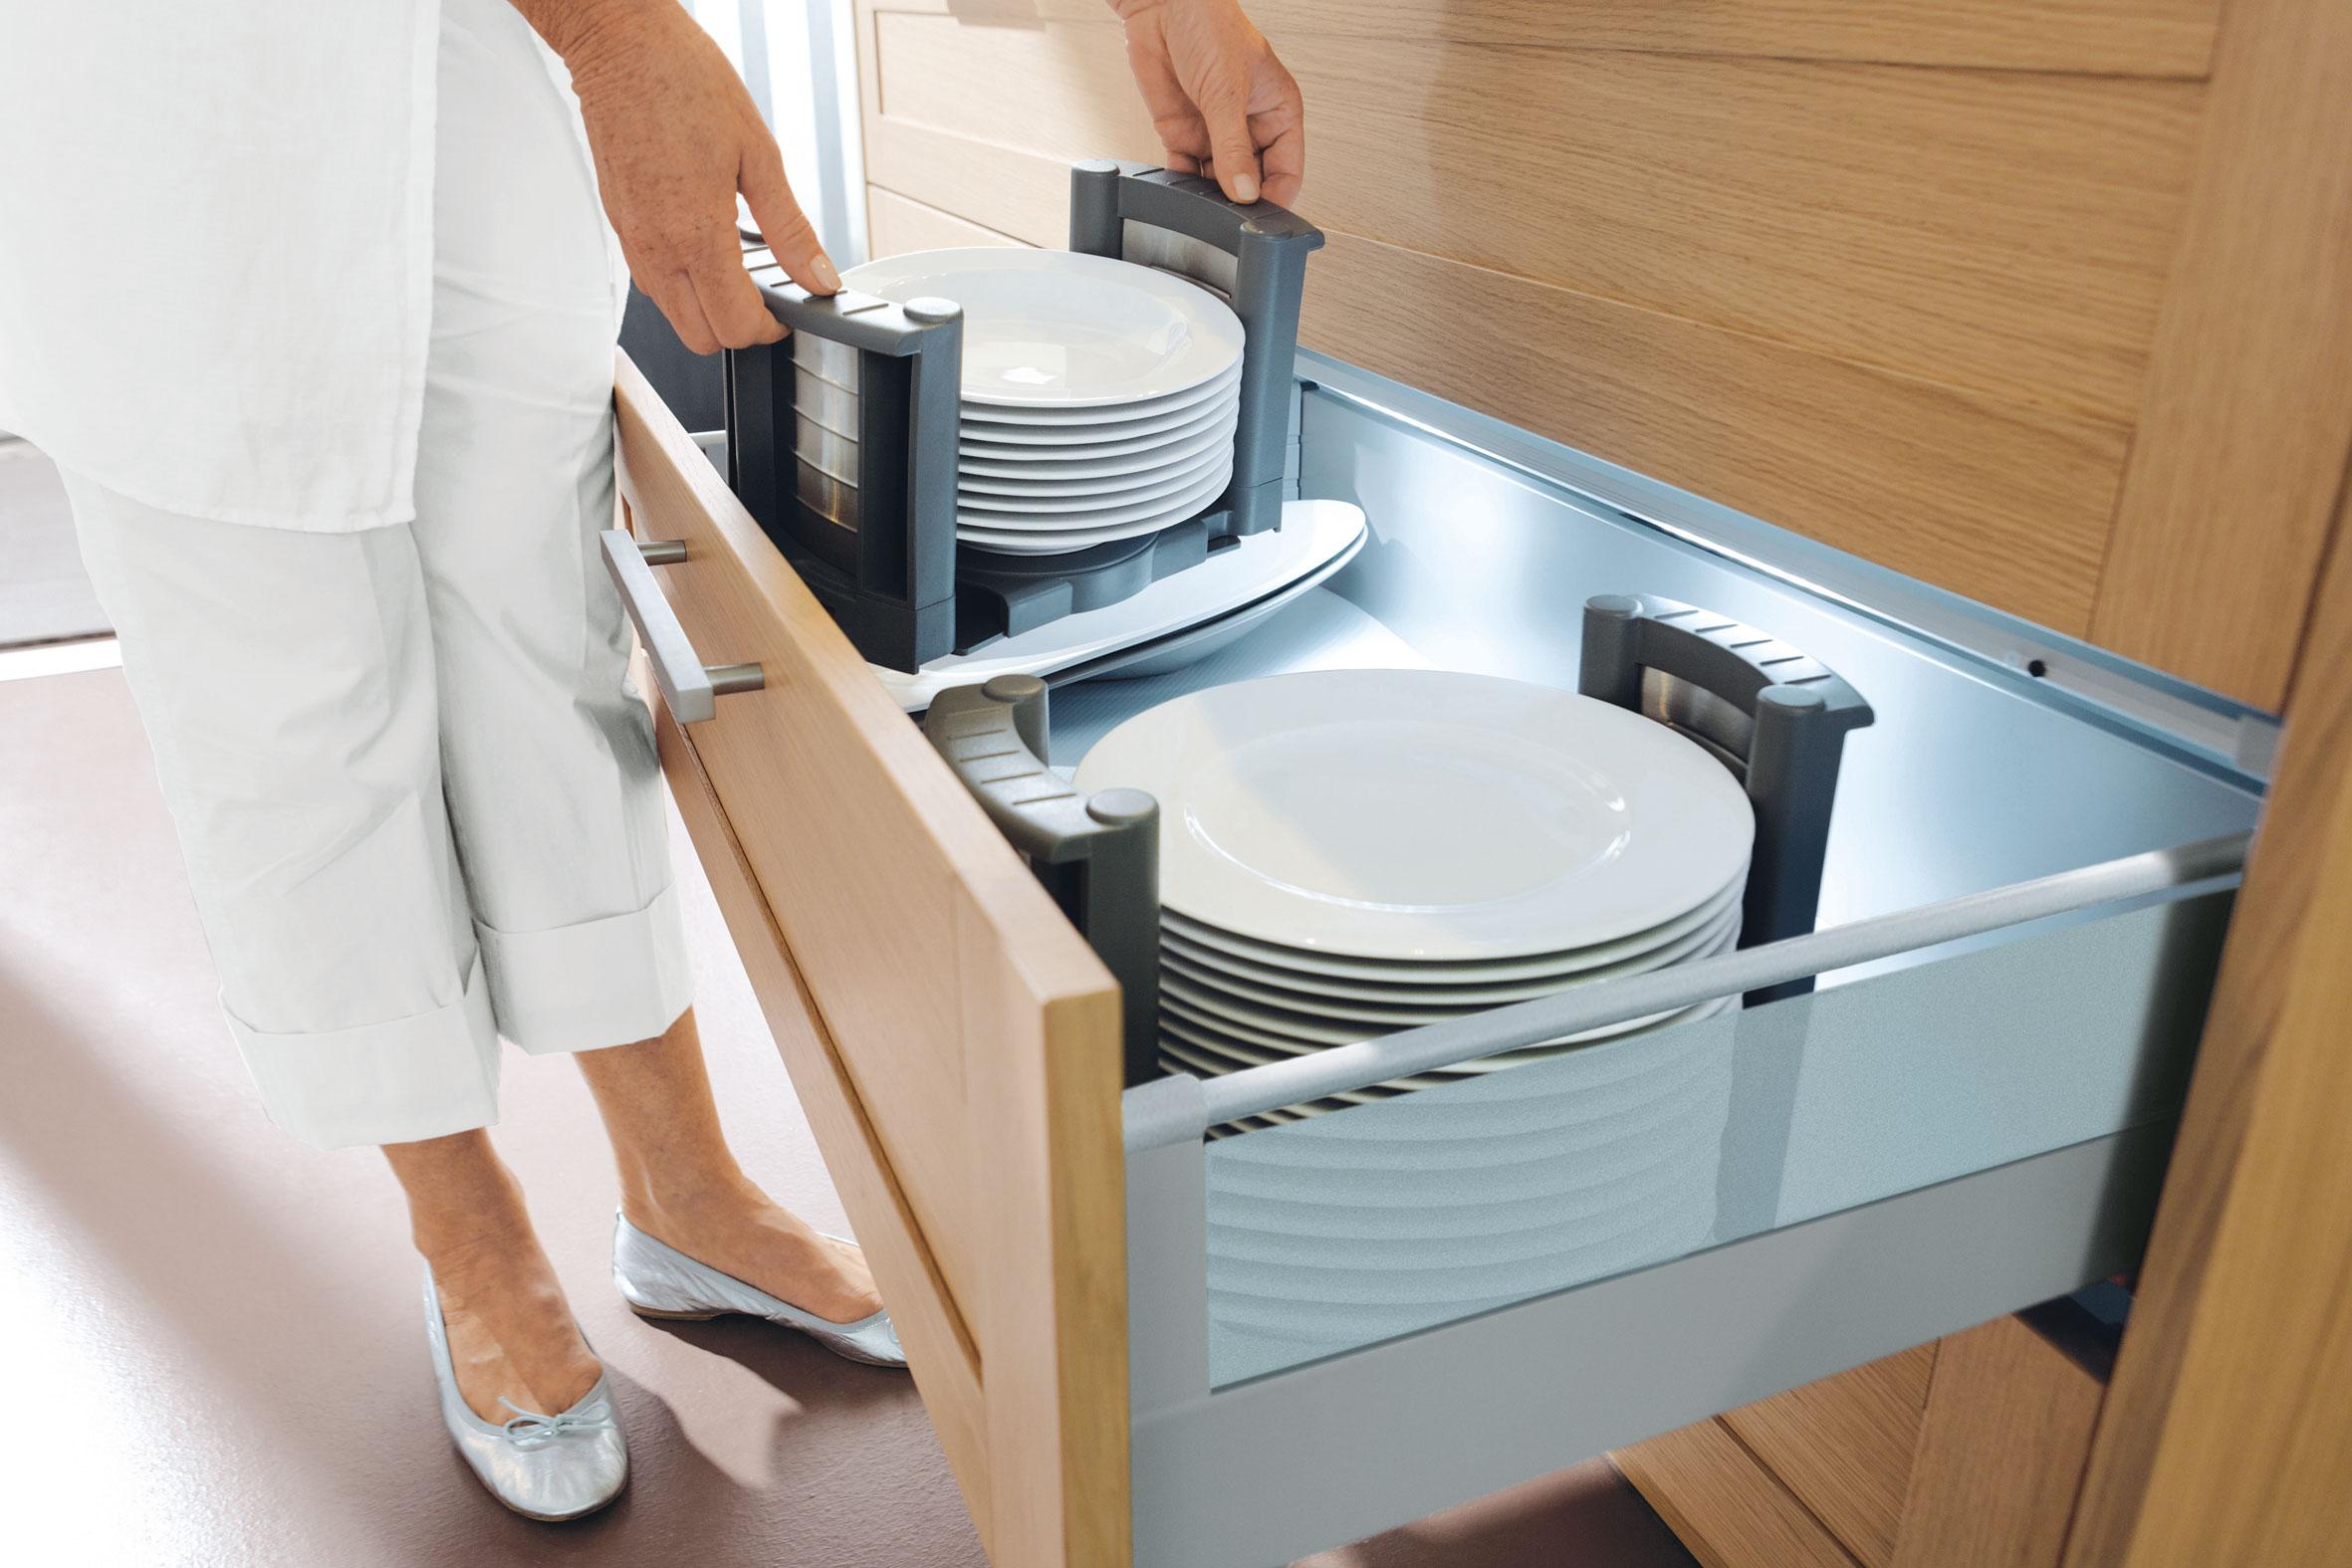 cuisine en bois naturel 1 photo de cuisine moderne. Black Bedroom Furniture Sets. Home Design Ideas